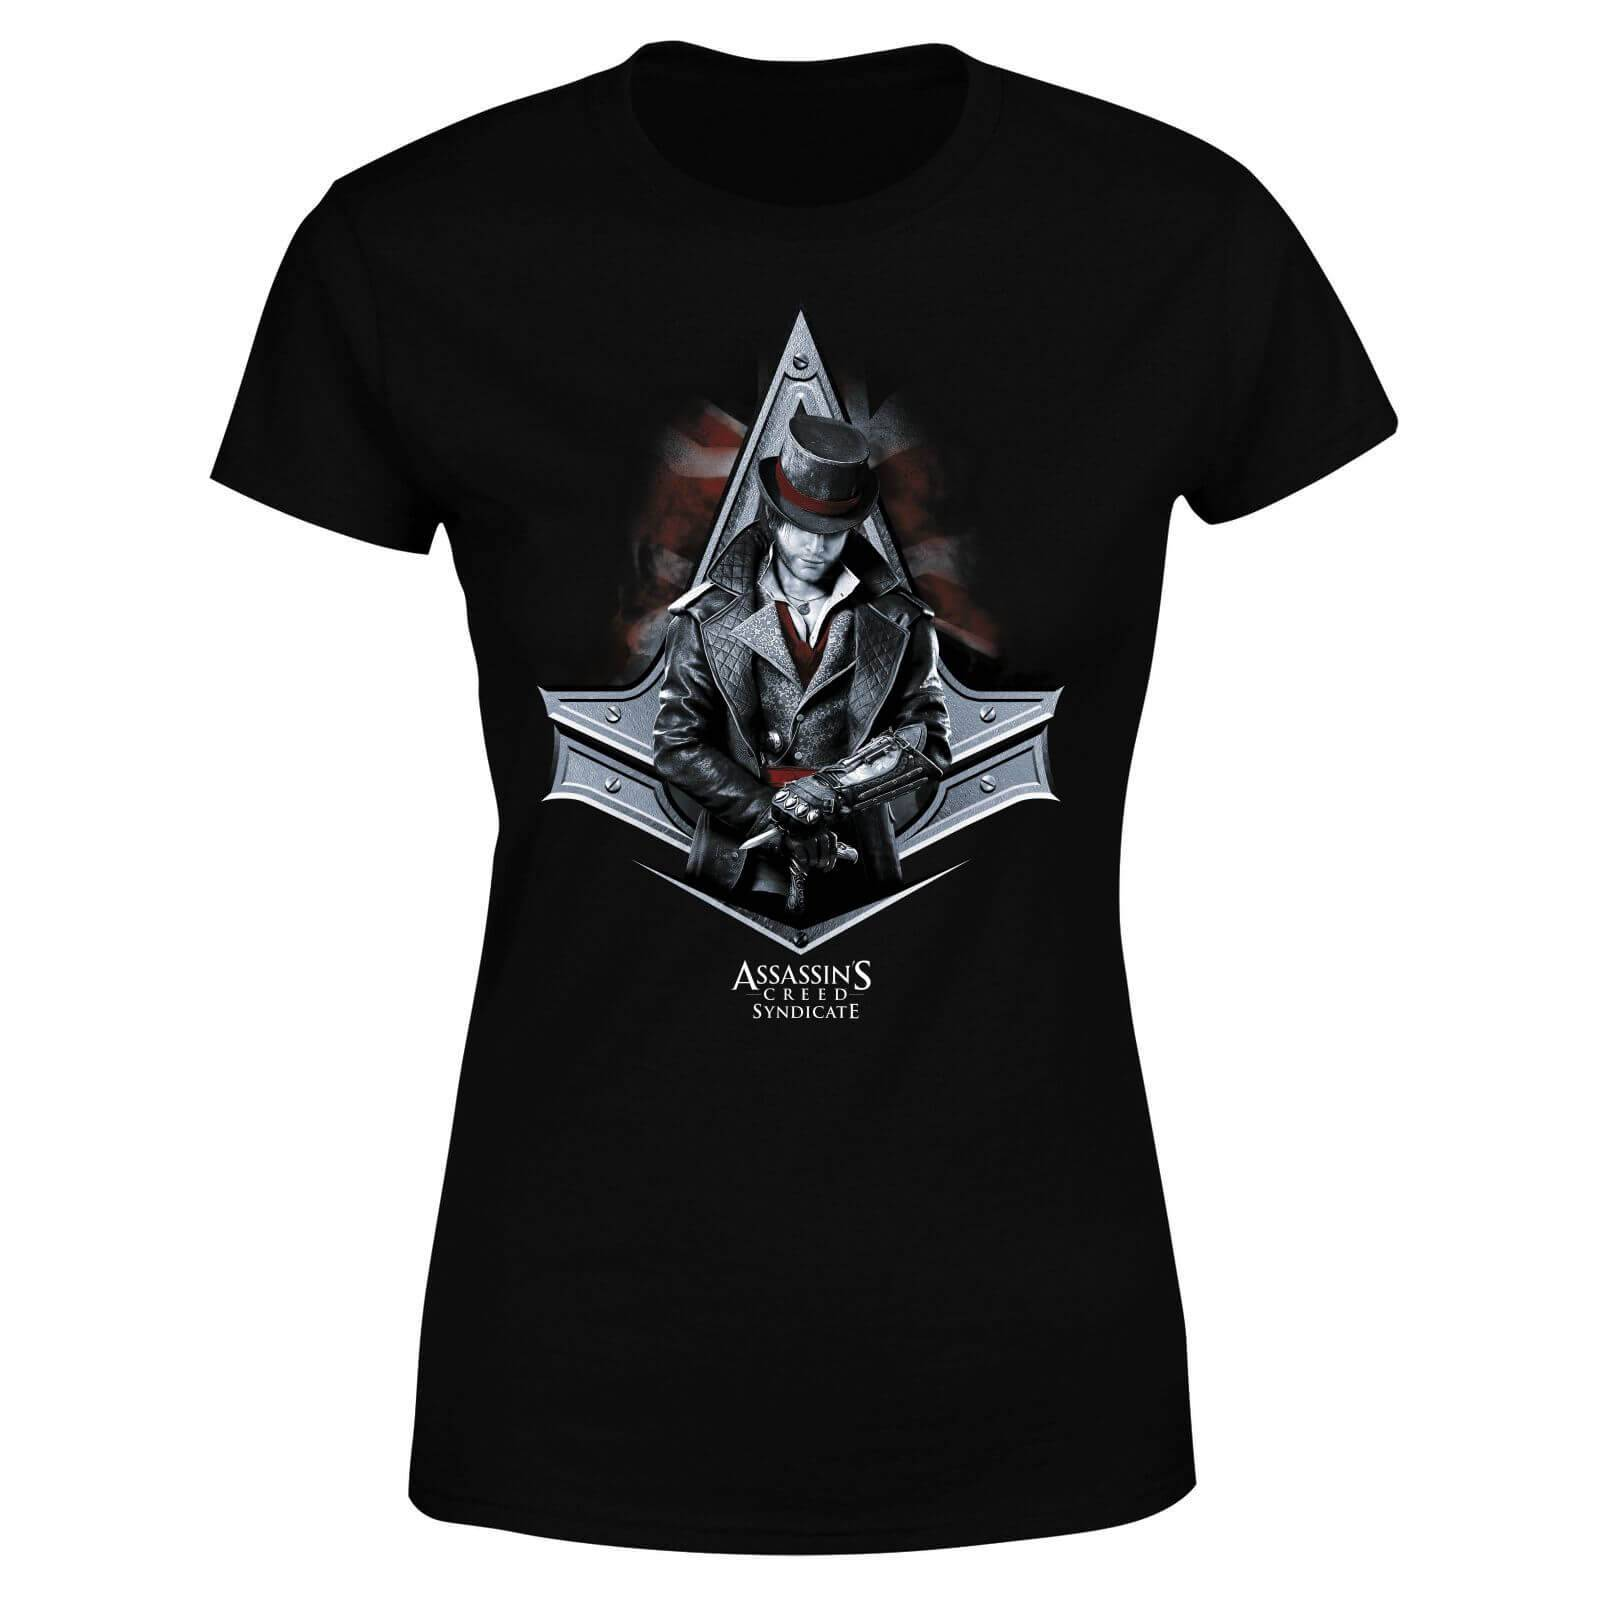 Assassin's Creed T-Shirt Femme Jacob Assassin's Creed Syndicate - Noir - XXL - Noir